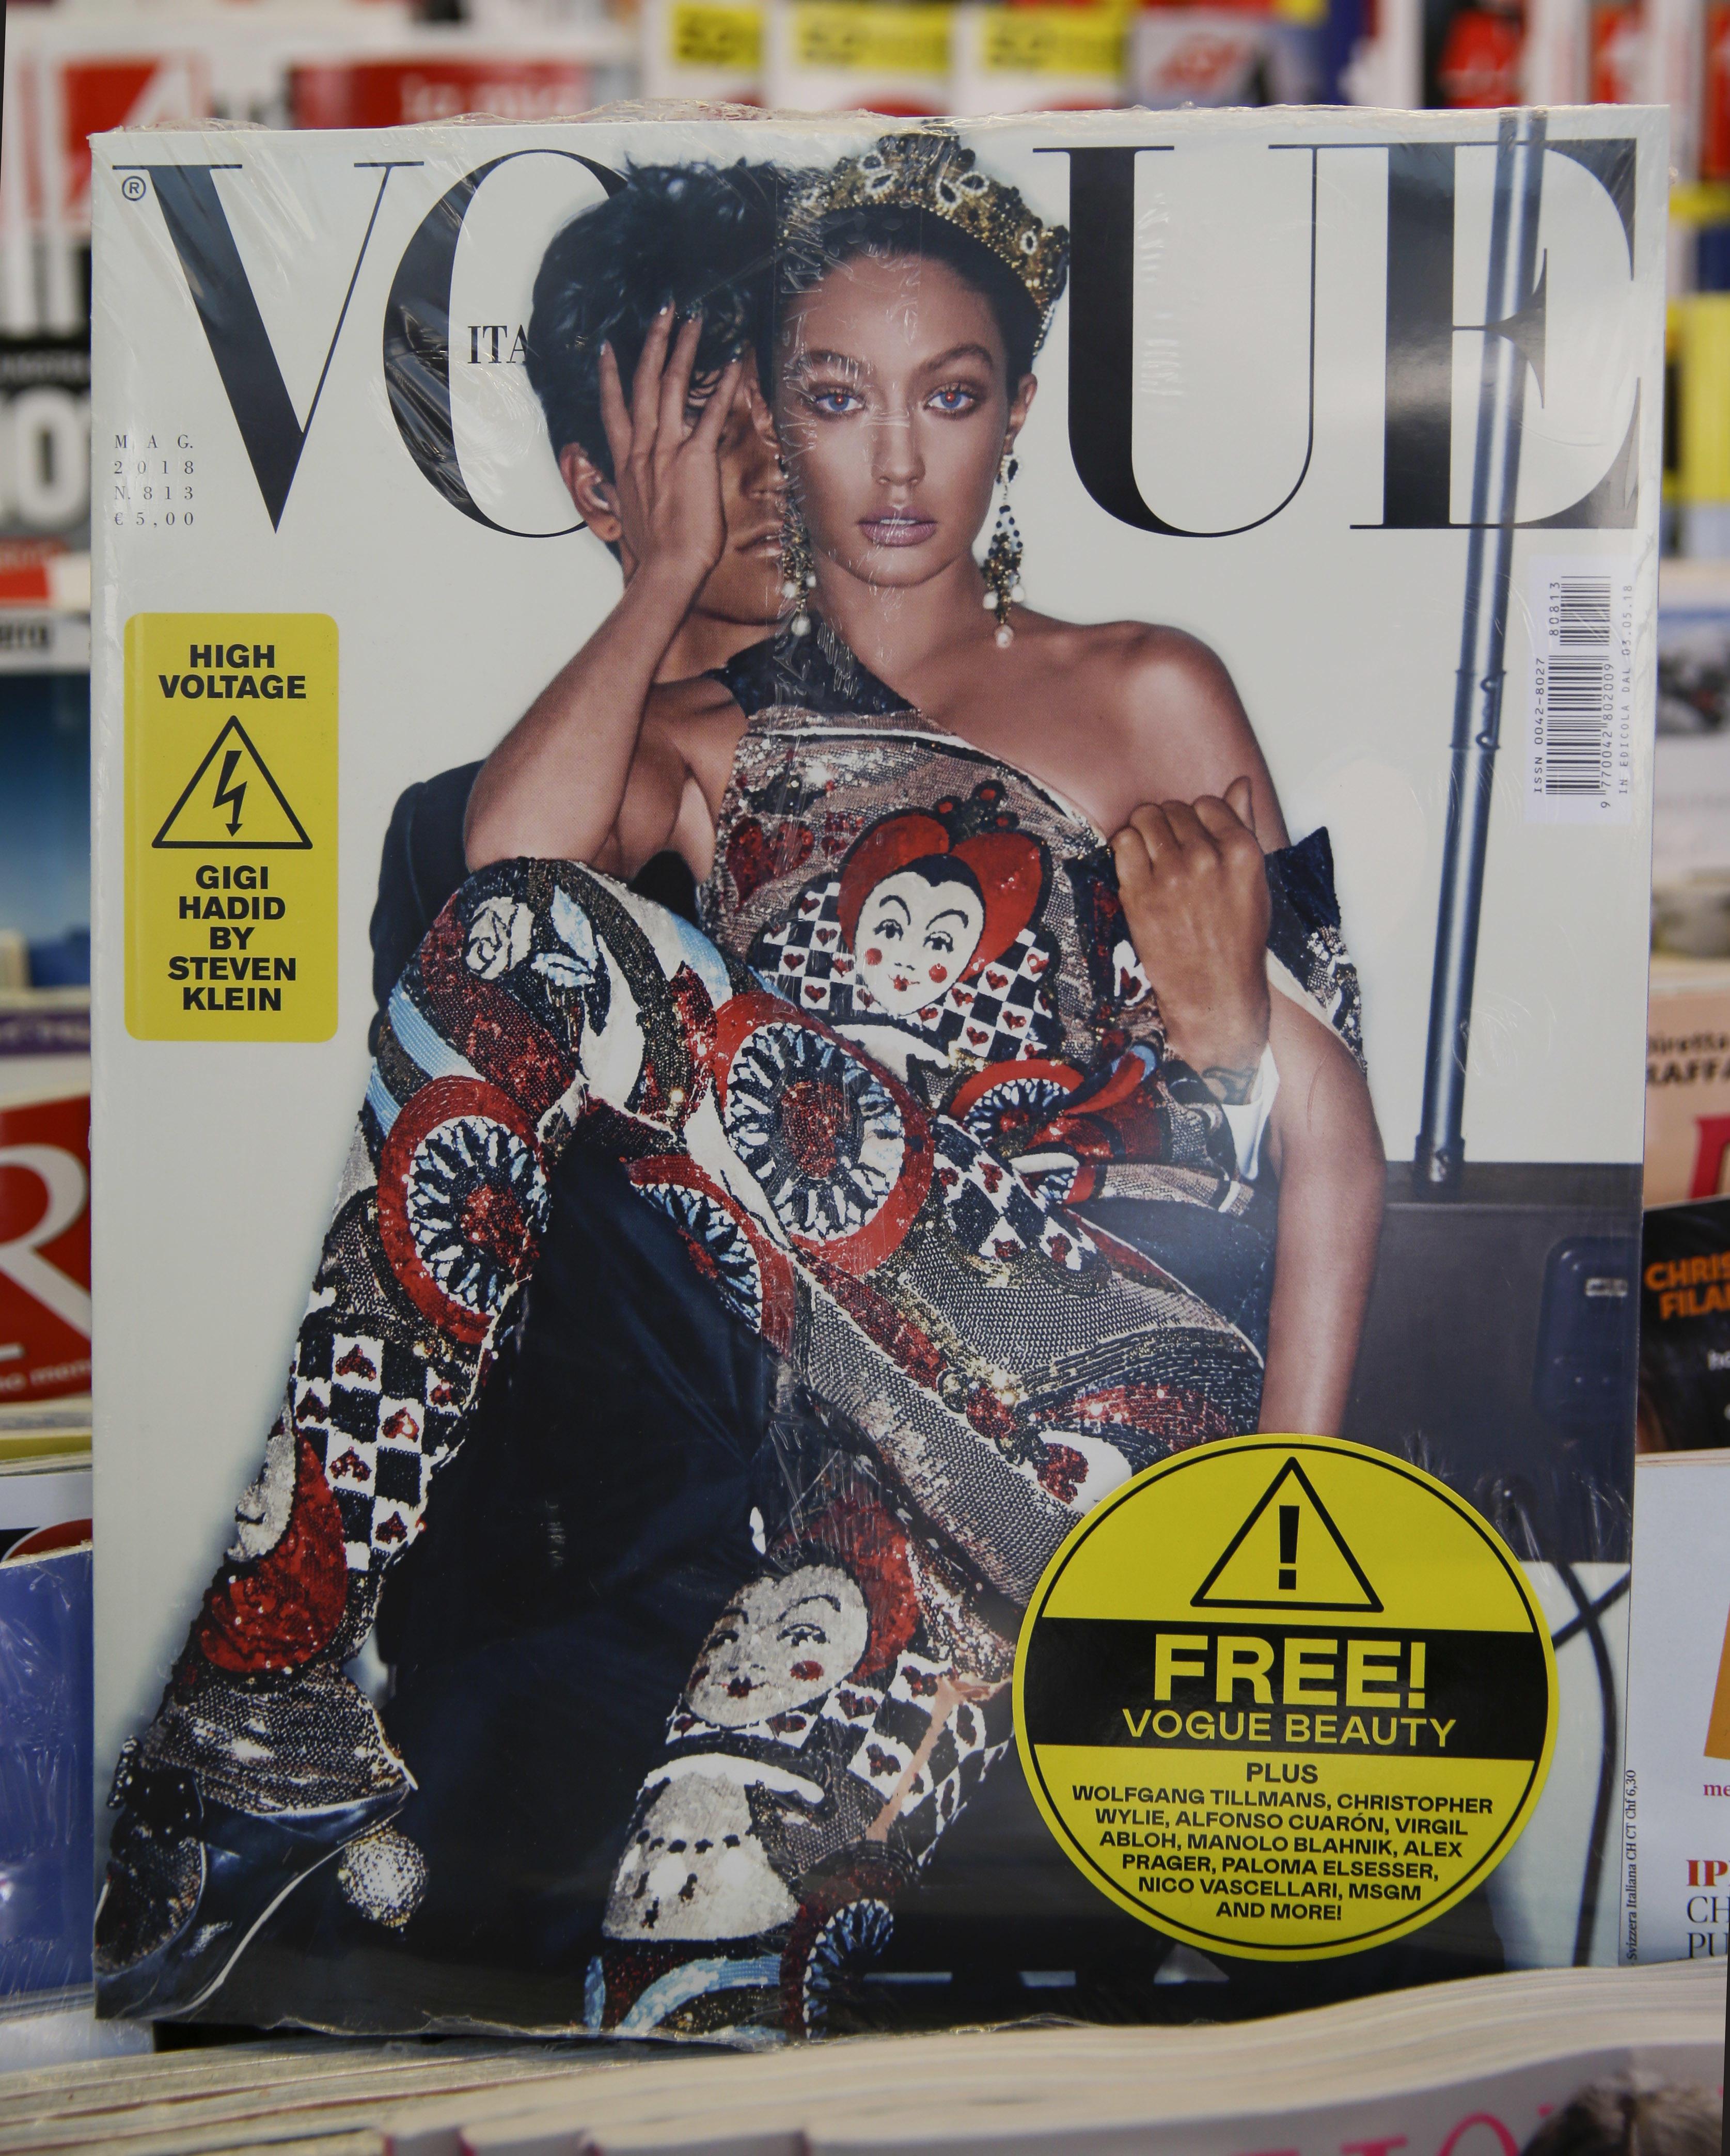 Vogue Italia and Gigi Hadid apologize for darkened skin tone on cover 89eacbeedcc9